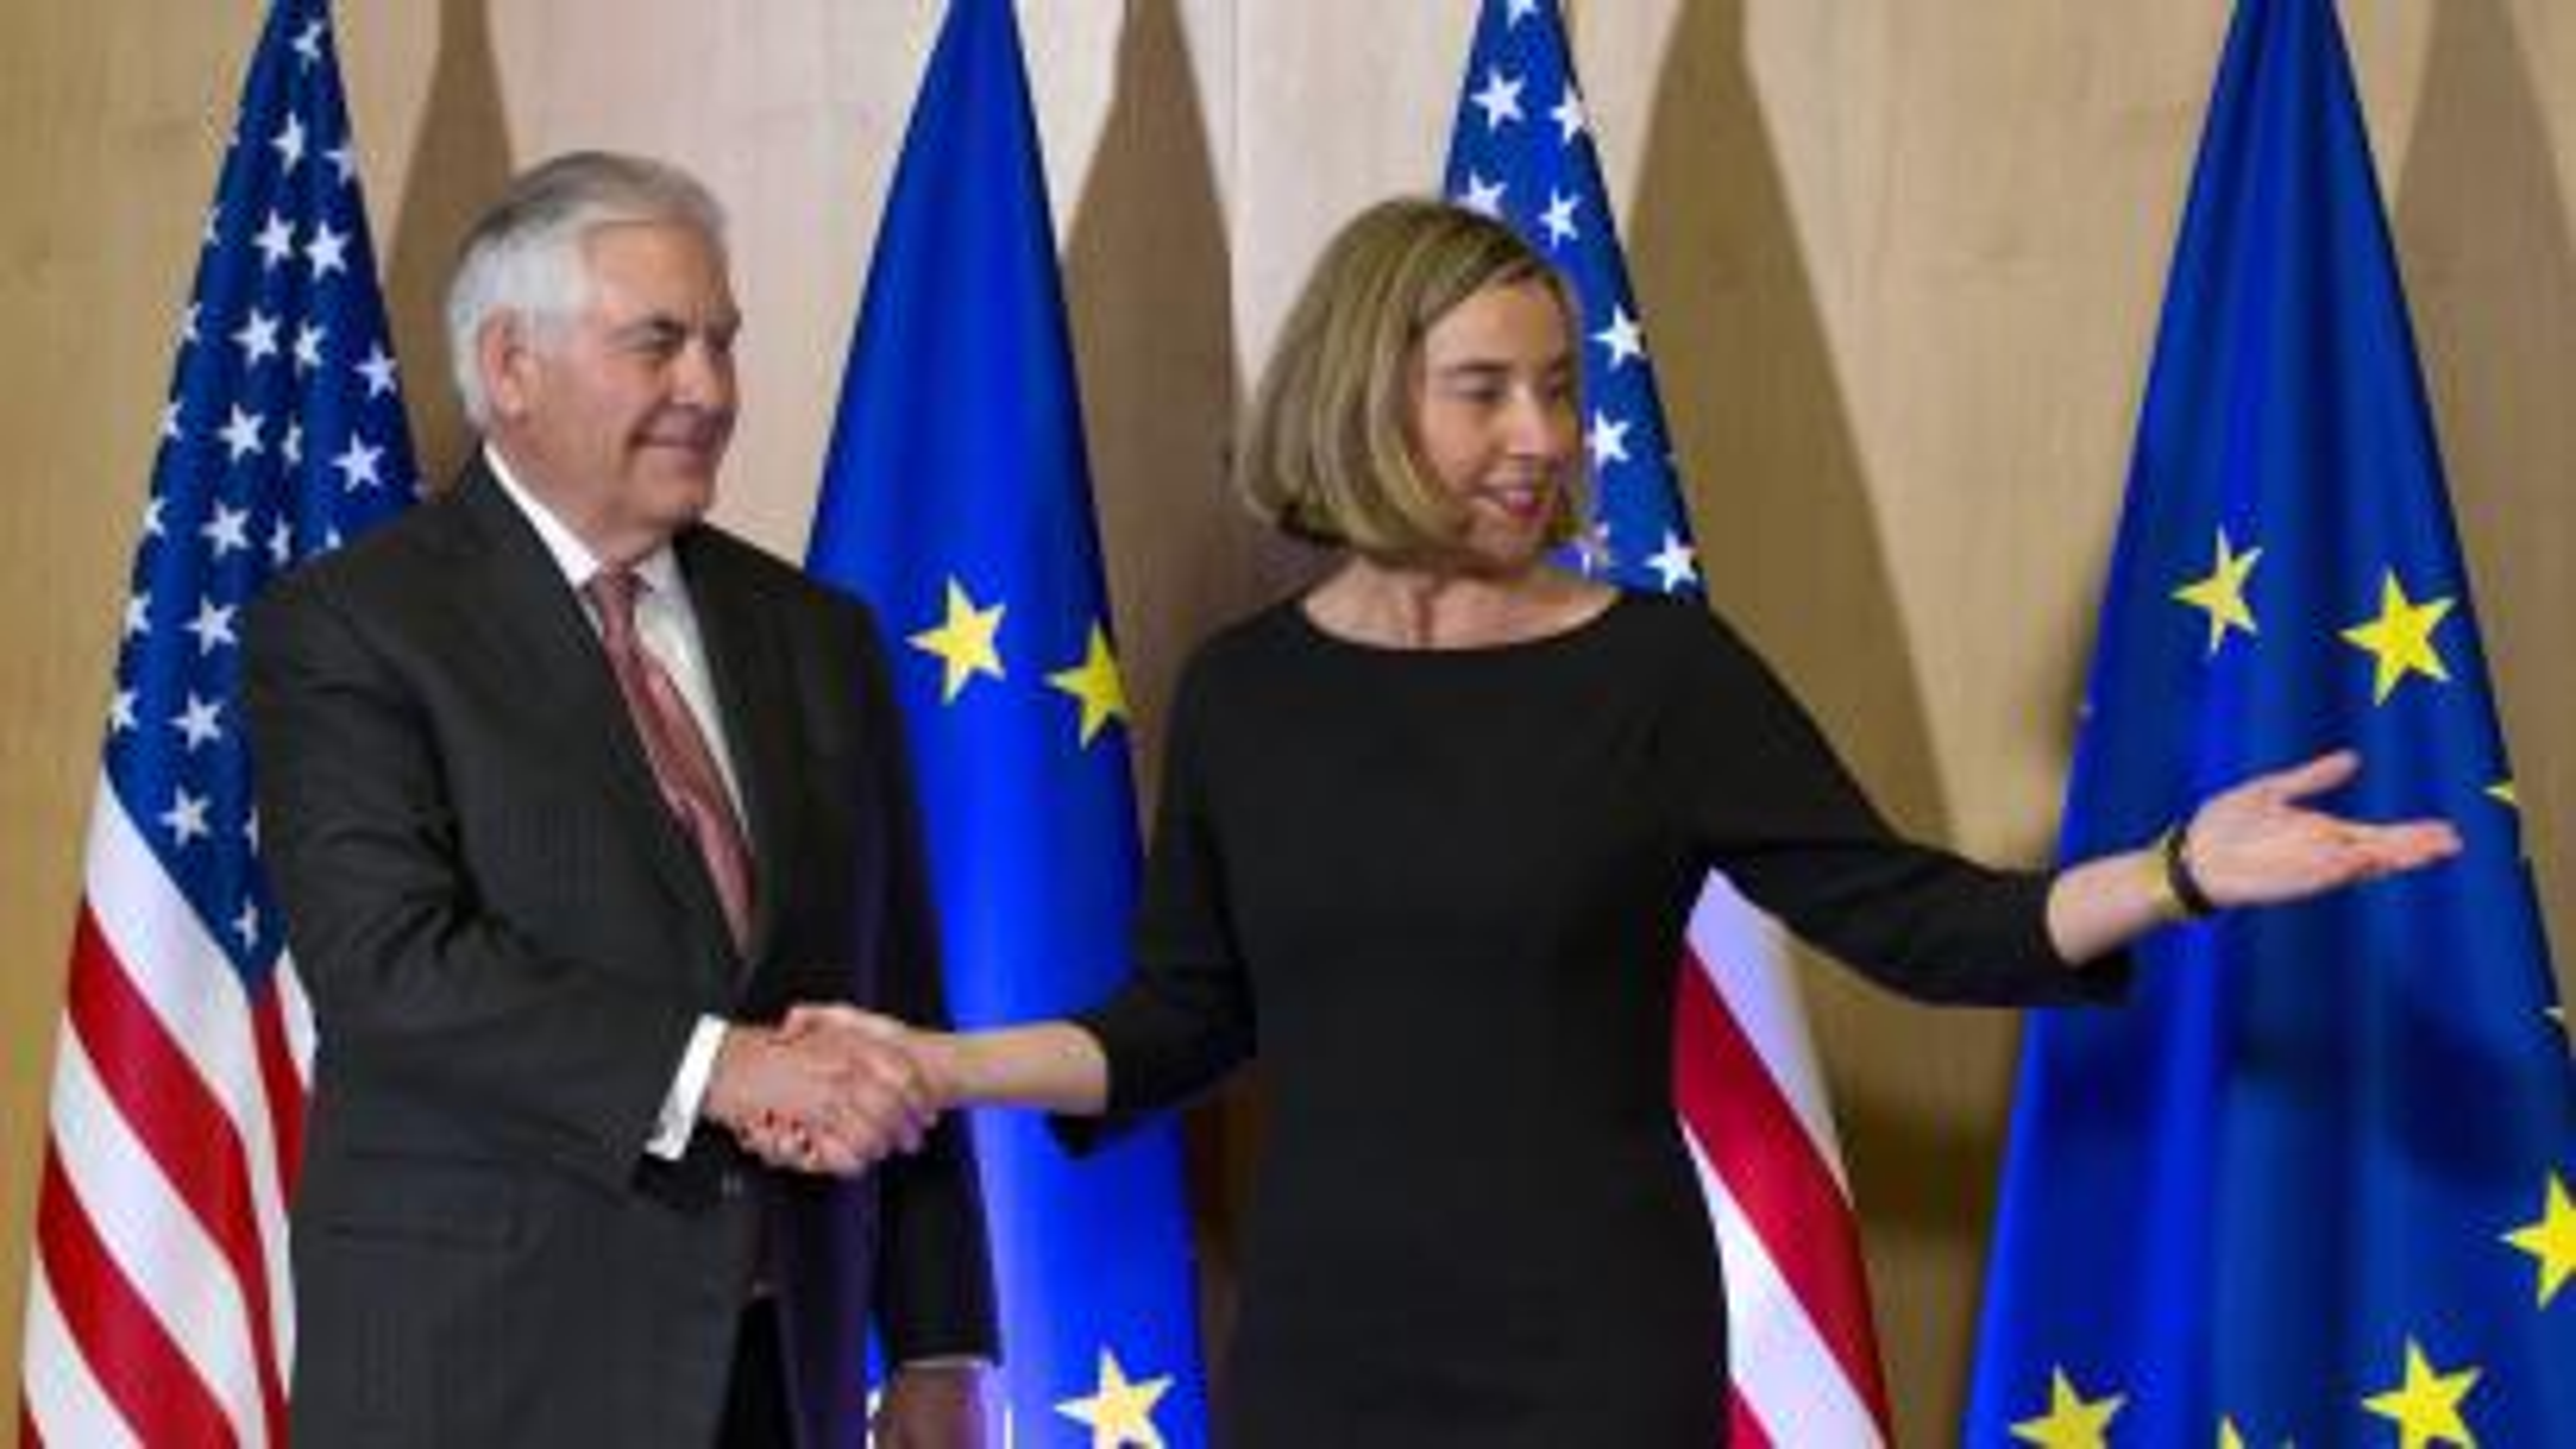 Brexit: The EU and Federica Mogherini